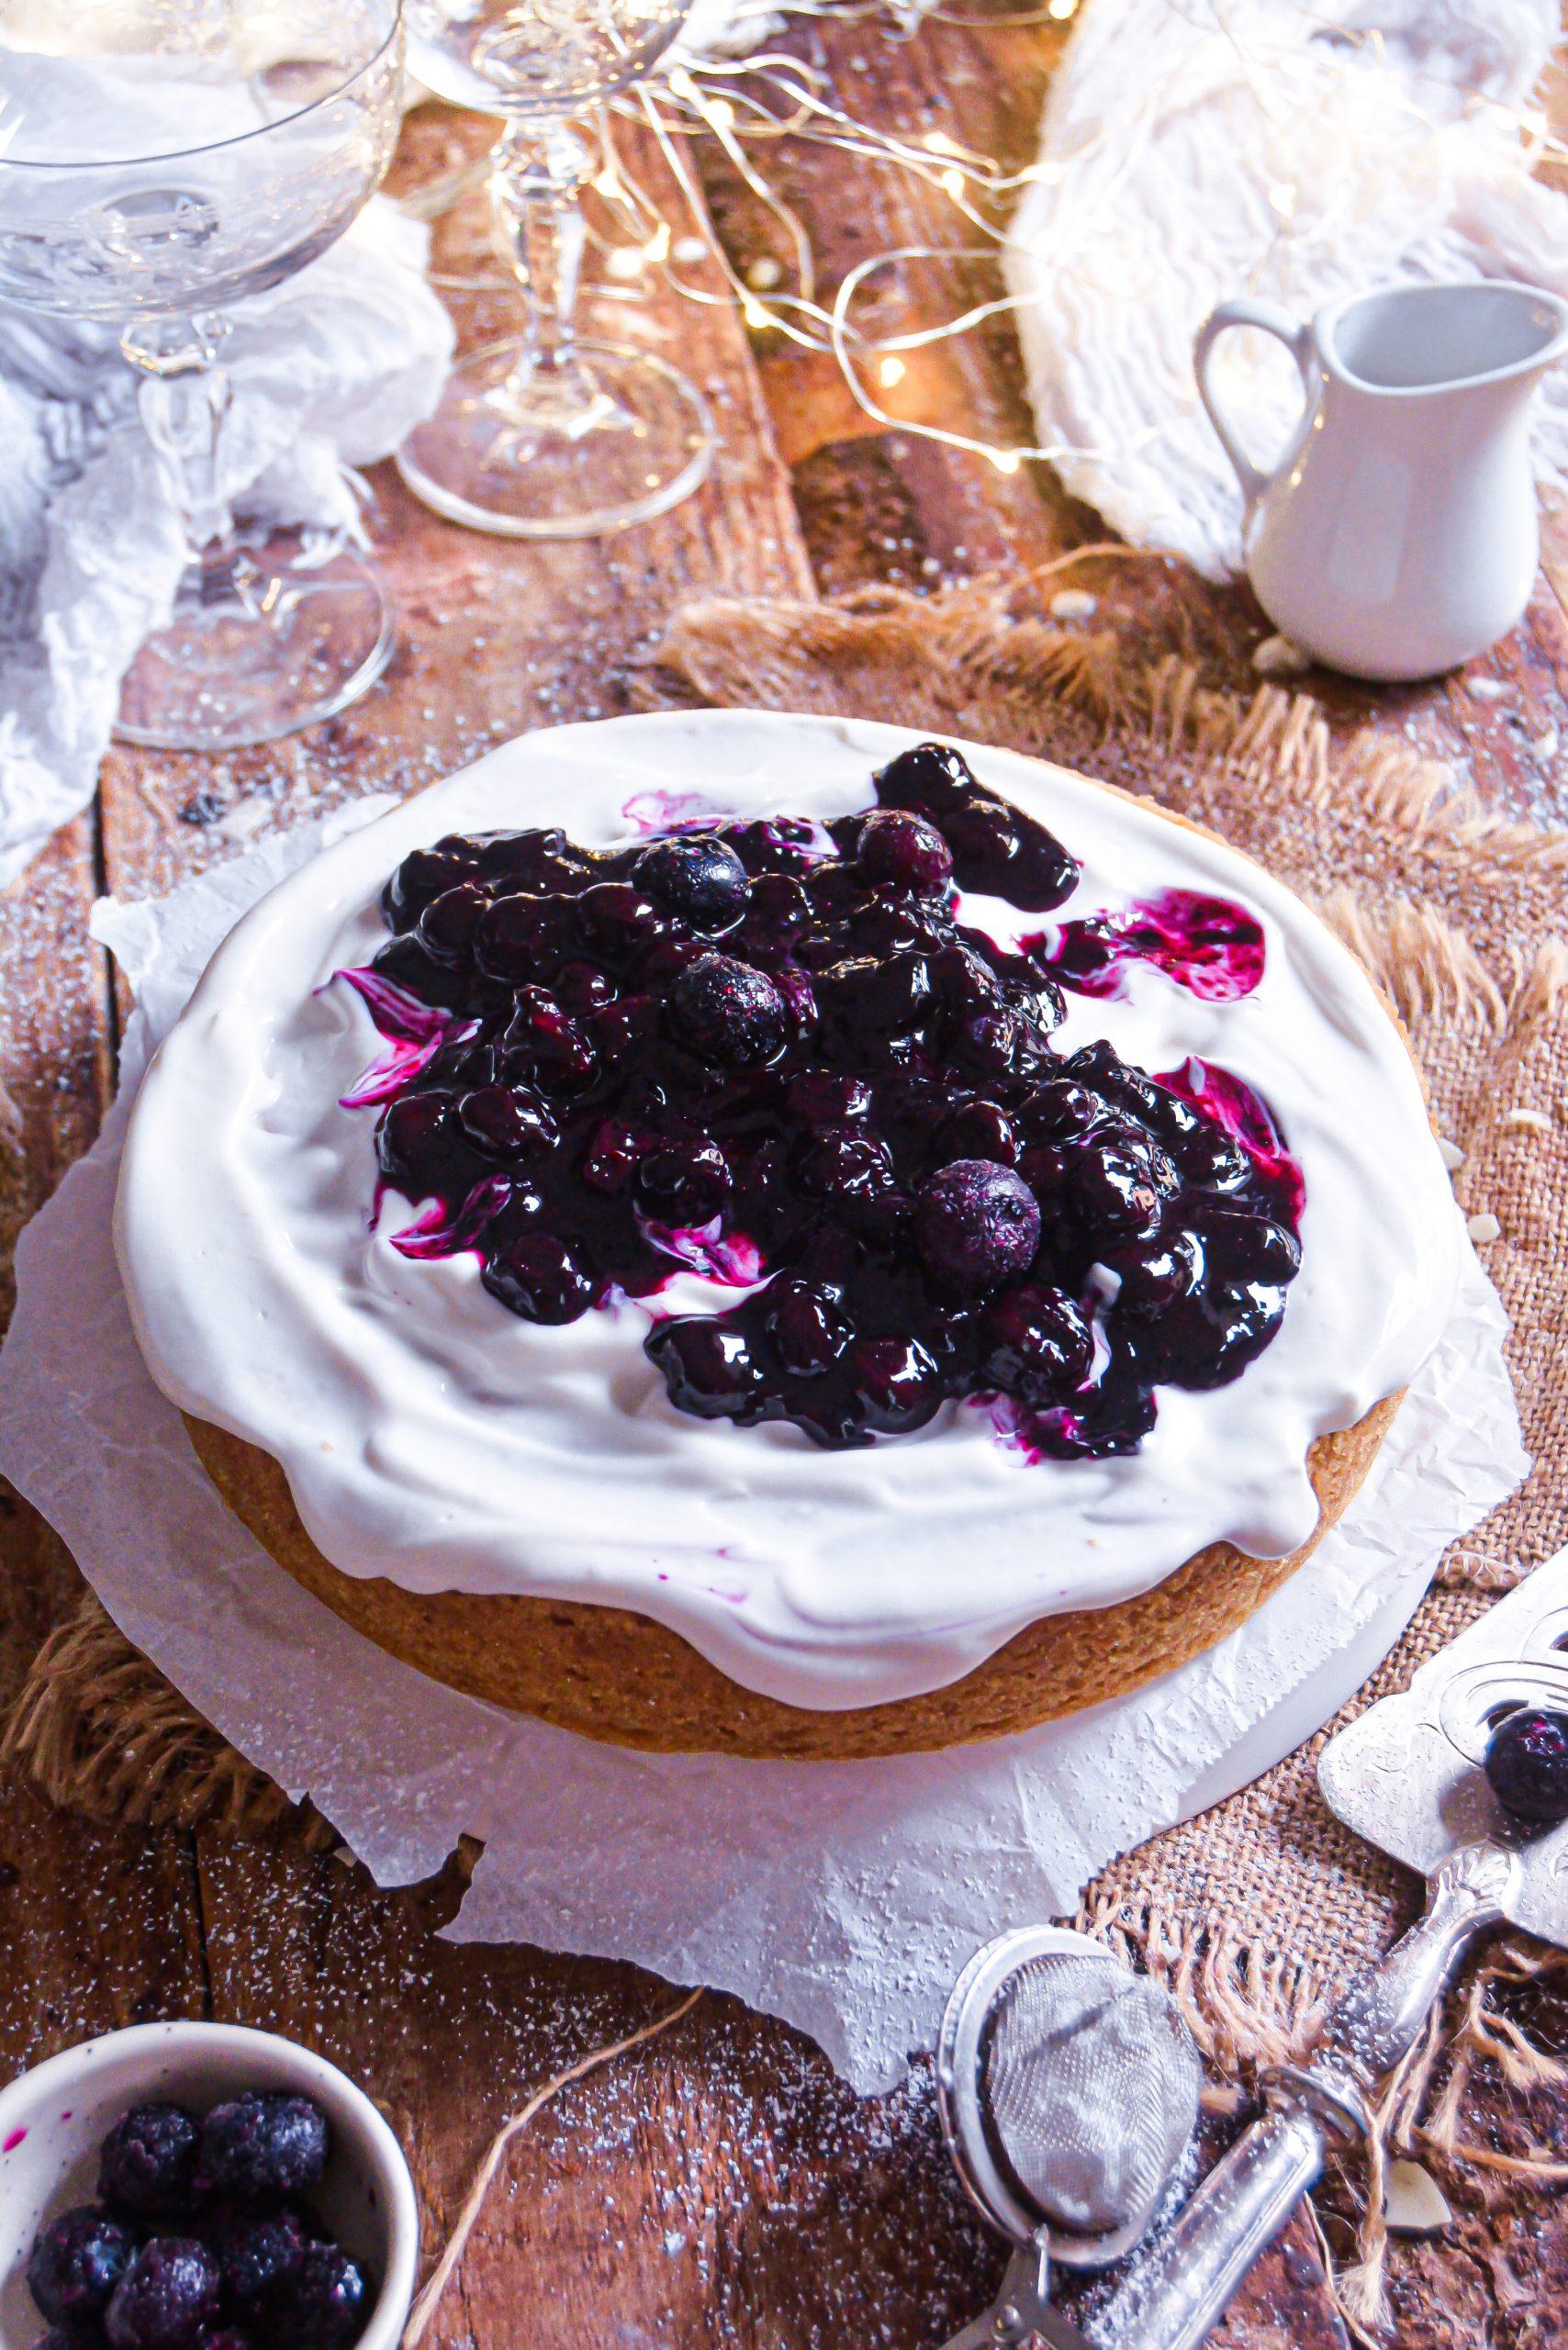 Gâteau Vegan au Citron de Nigella Lawson / Tender Vegan Lemon Cake by Nigella Lawson